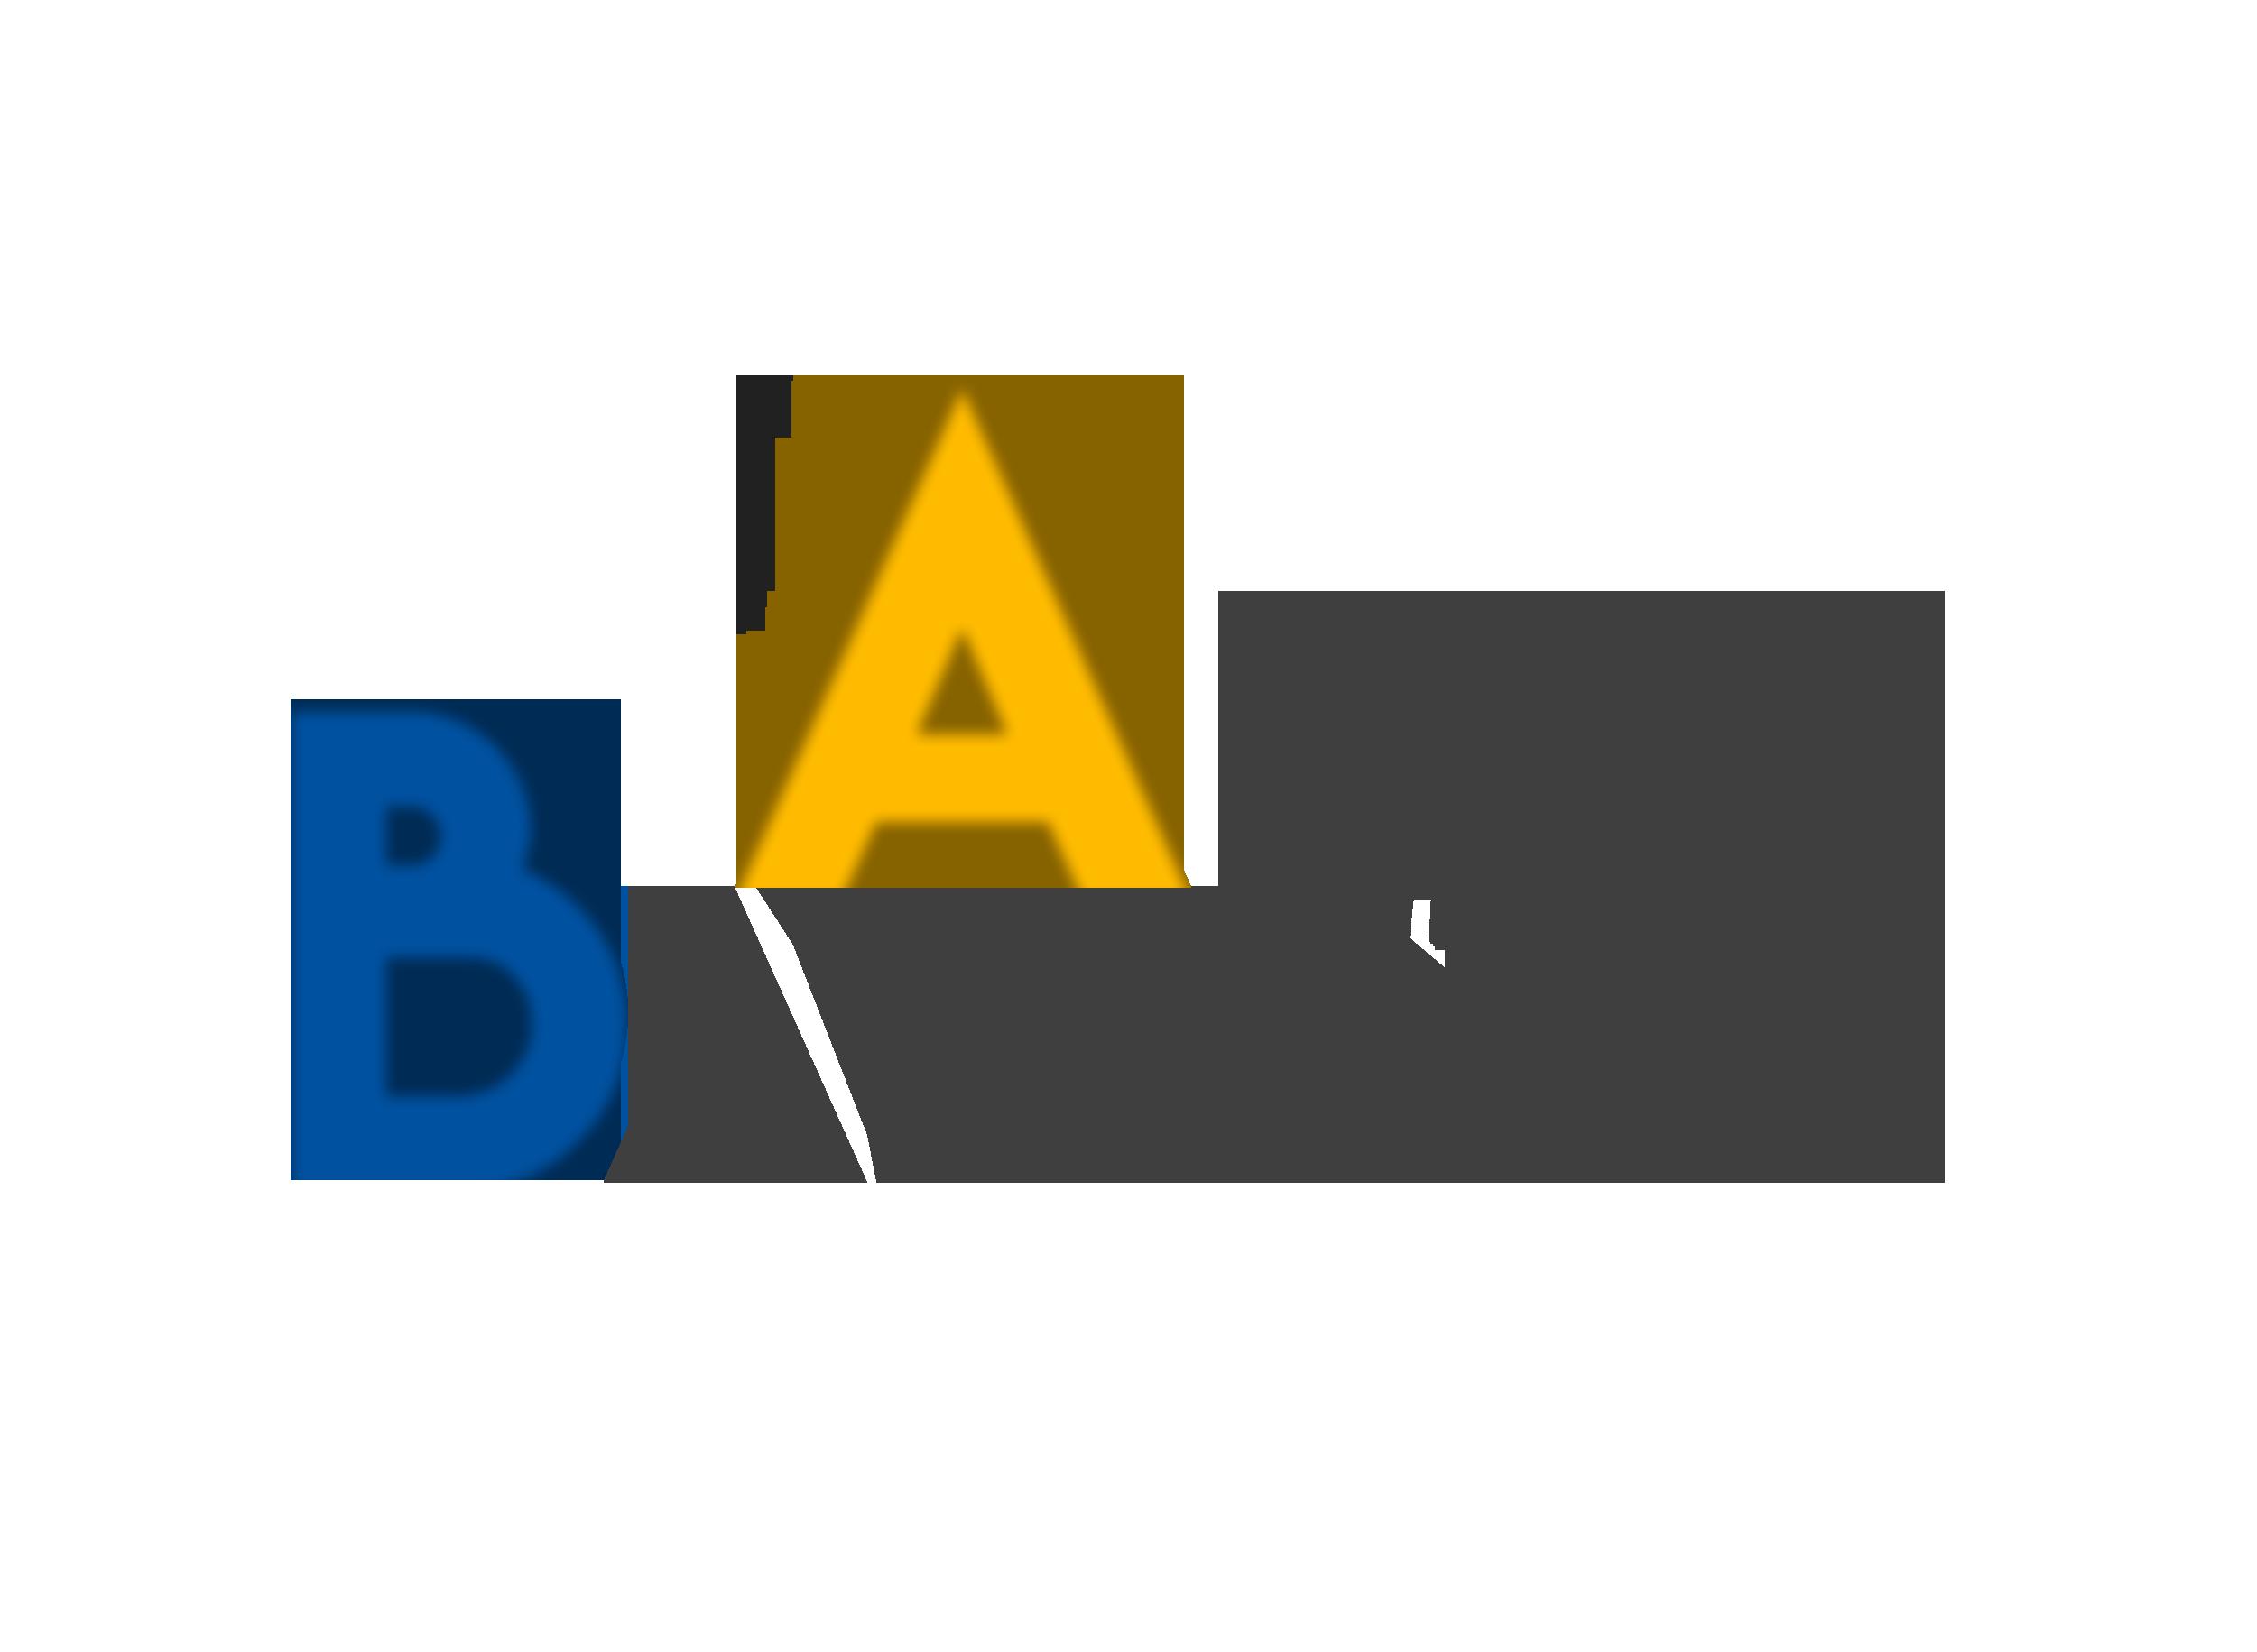 amicidel barozzi logo (1)